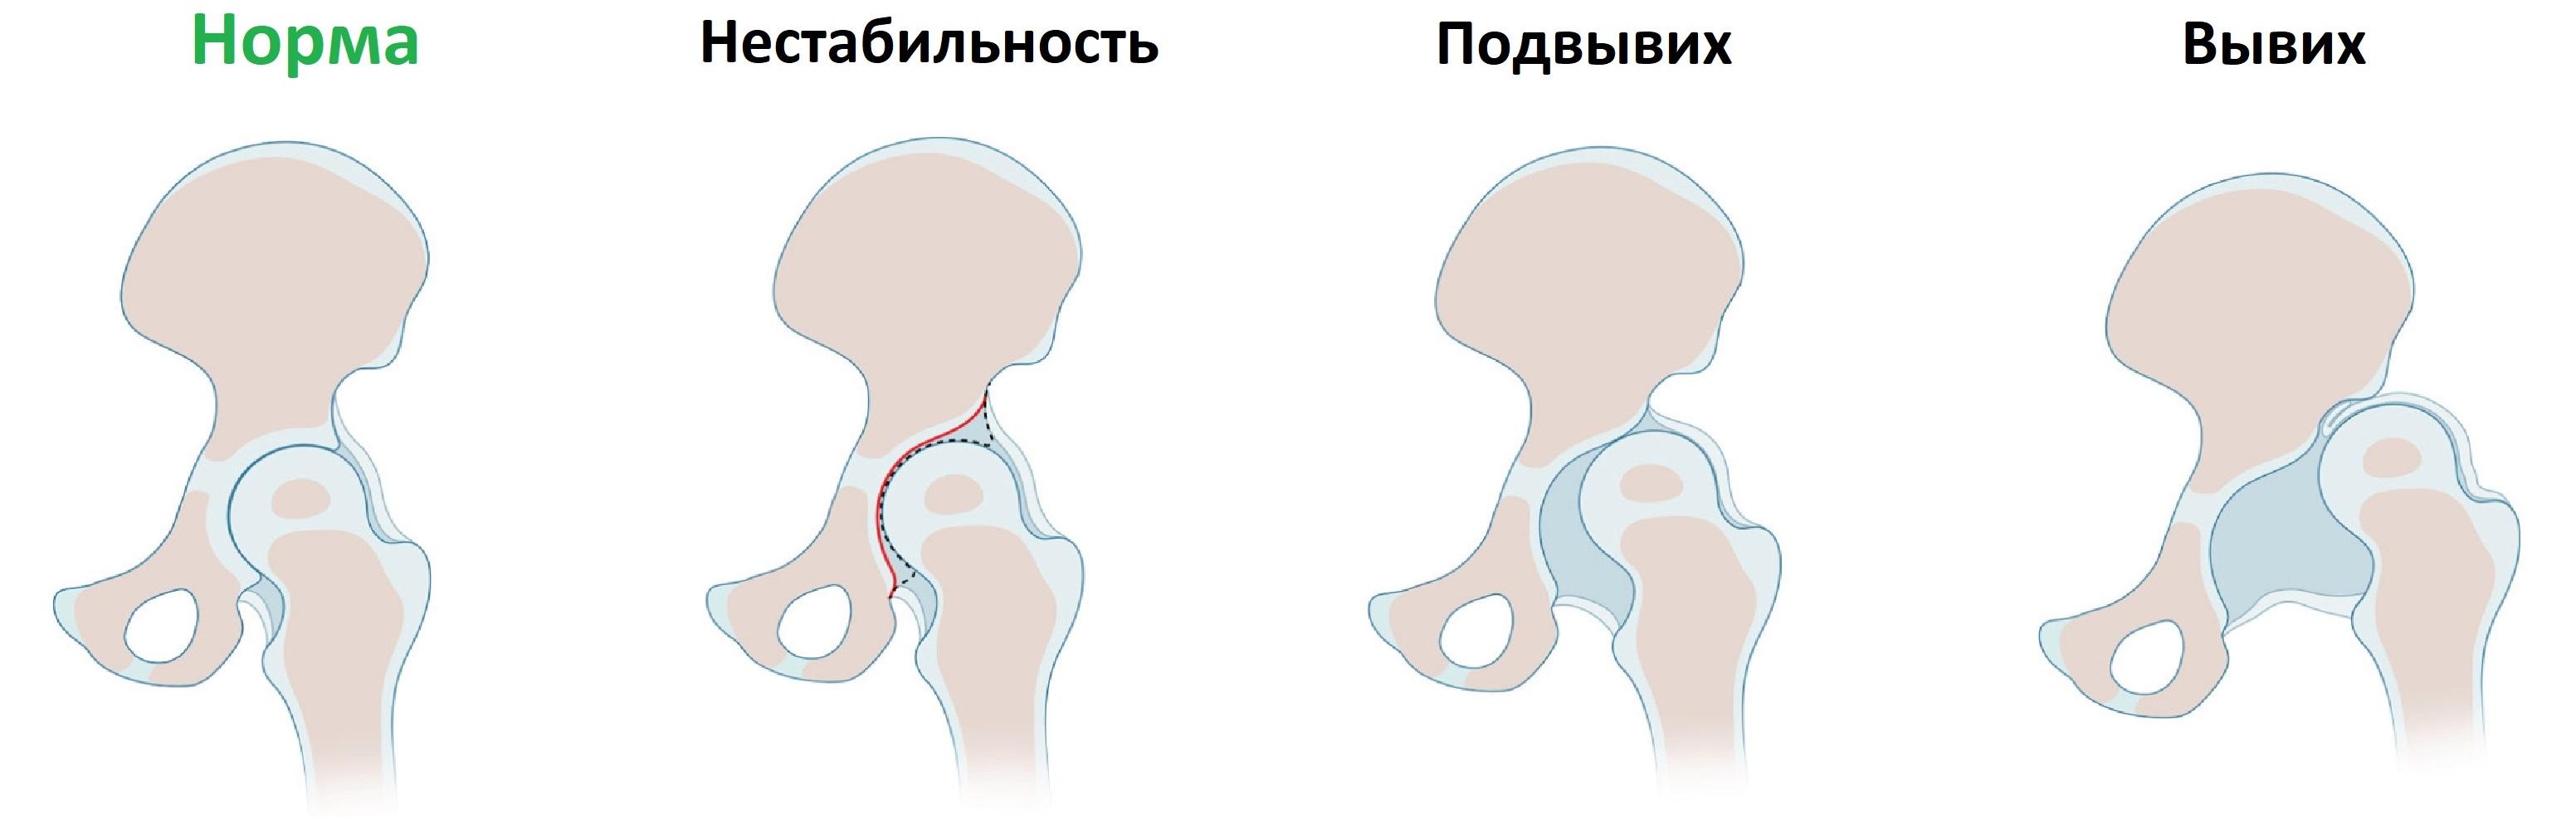 Изображение - Узд тазобедренного сустава у детей презентация Displaziya-2